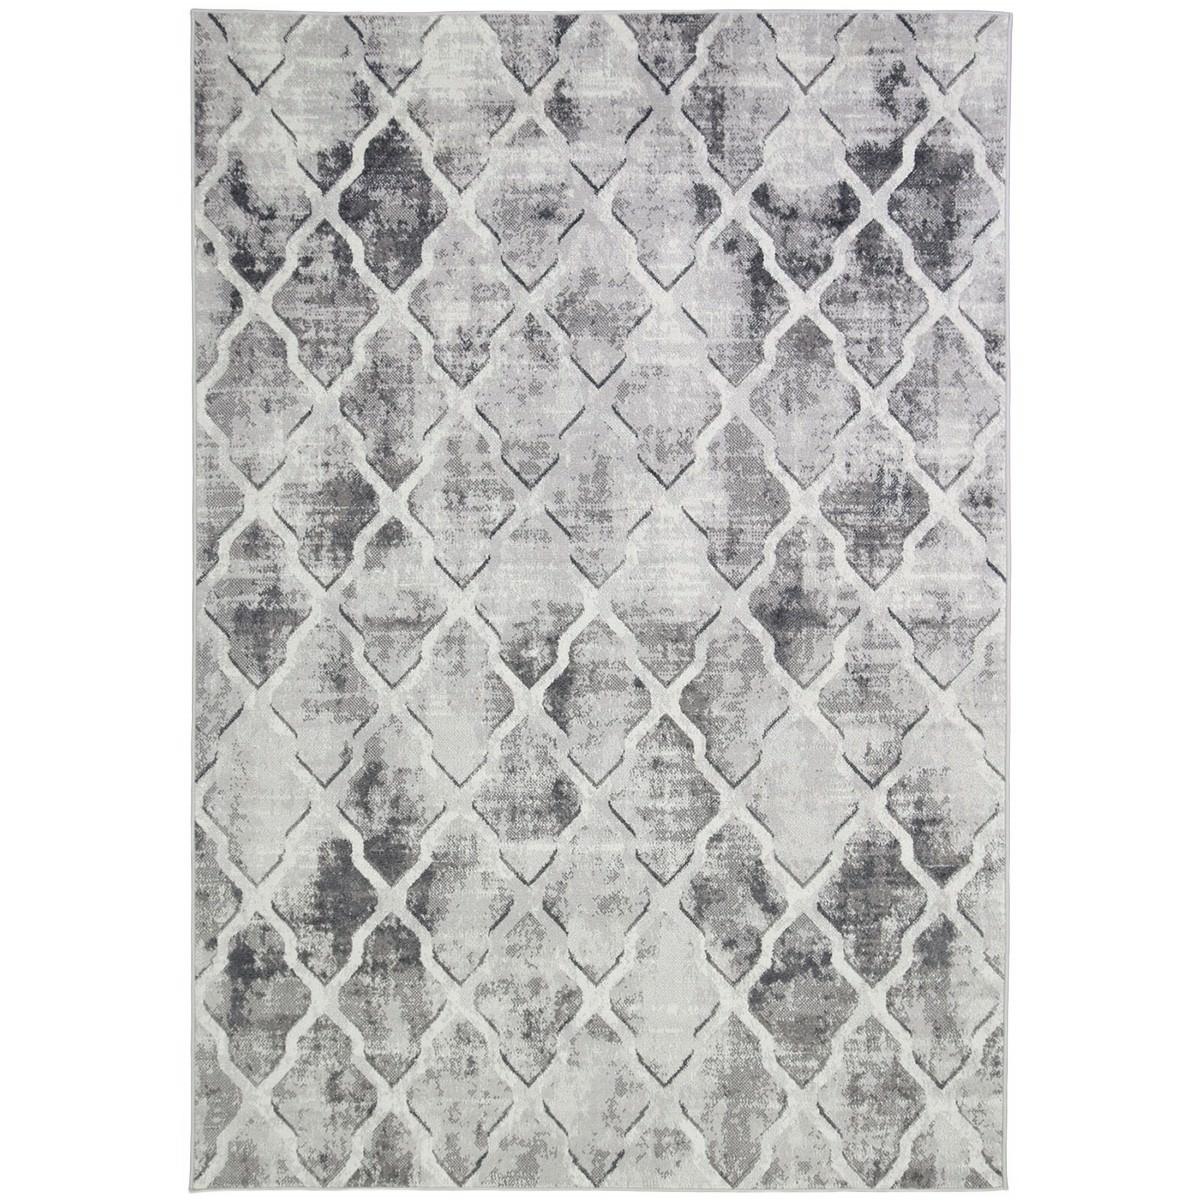 Courtyard Trellis Textured Modern Rug, 150x80cm, Grey